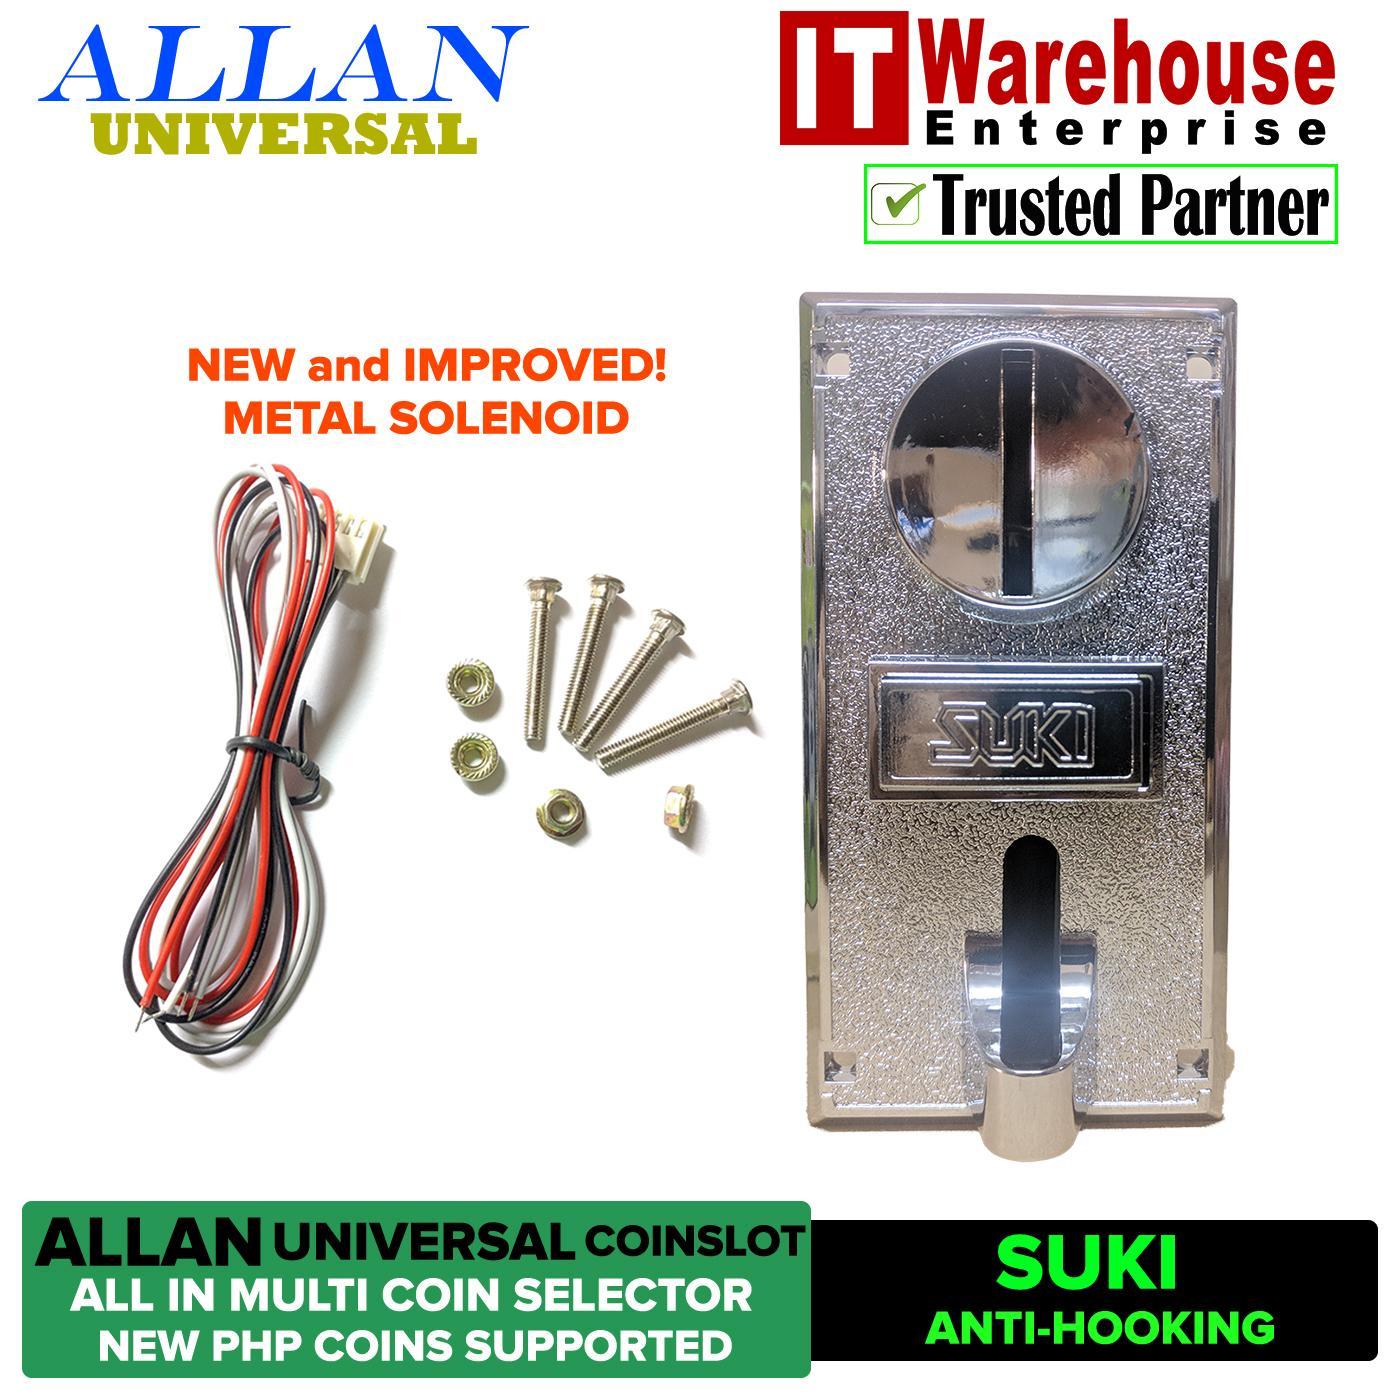 Allan Universal Latest 1238a / Suki Coin Selector Coinslot Acceptor Multi Coin Selector For Piso Pisowifi Pisonet Coin Slot By It Warehouse Enterprise.